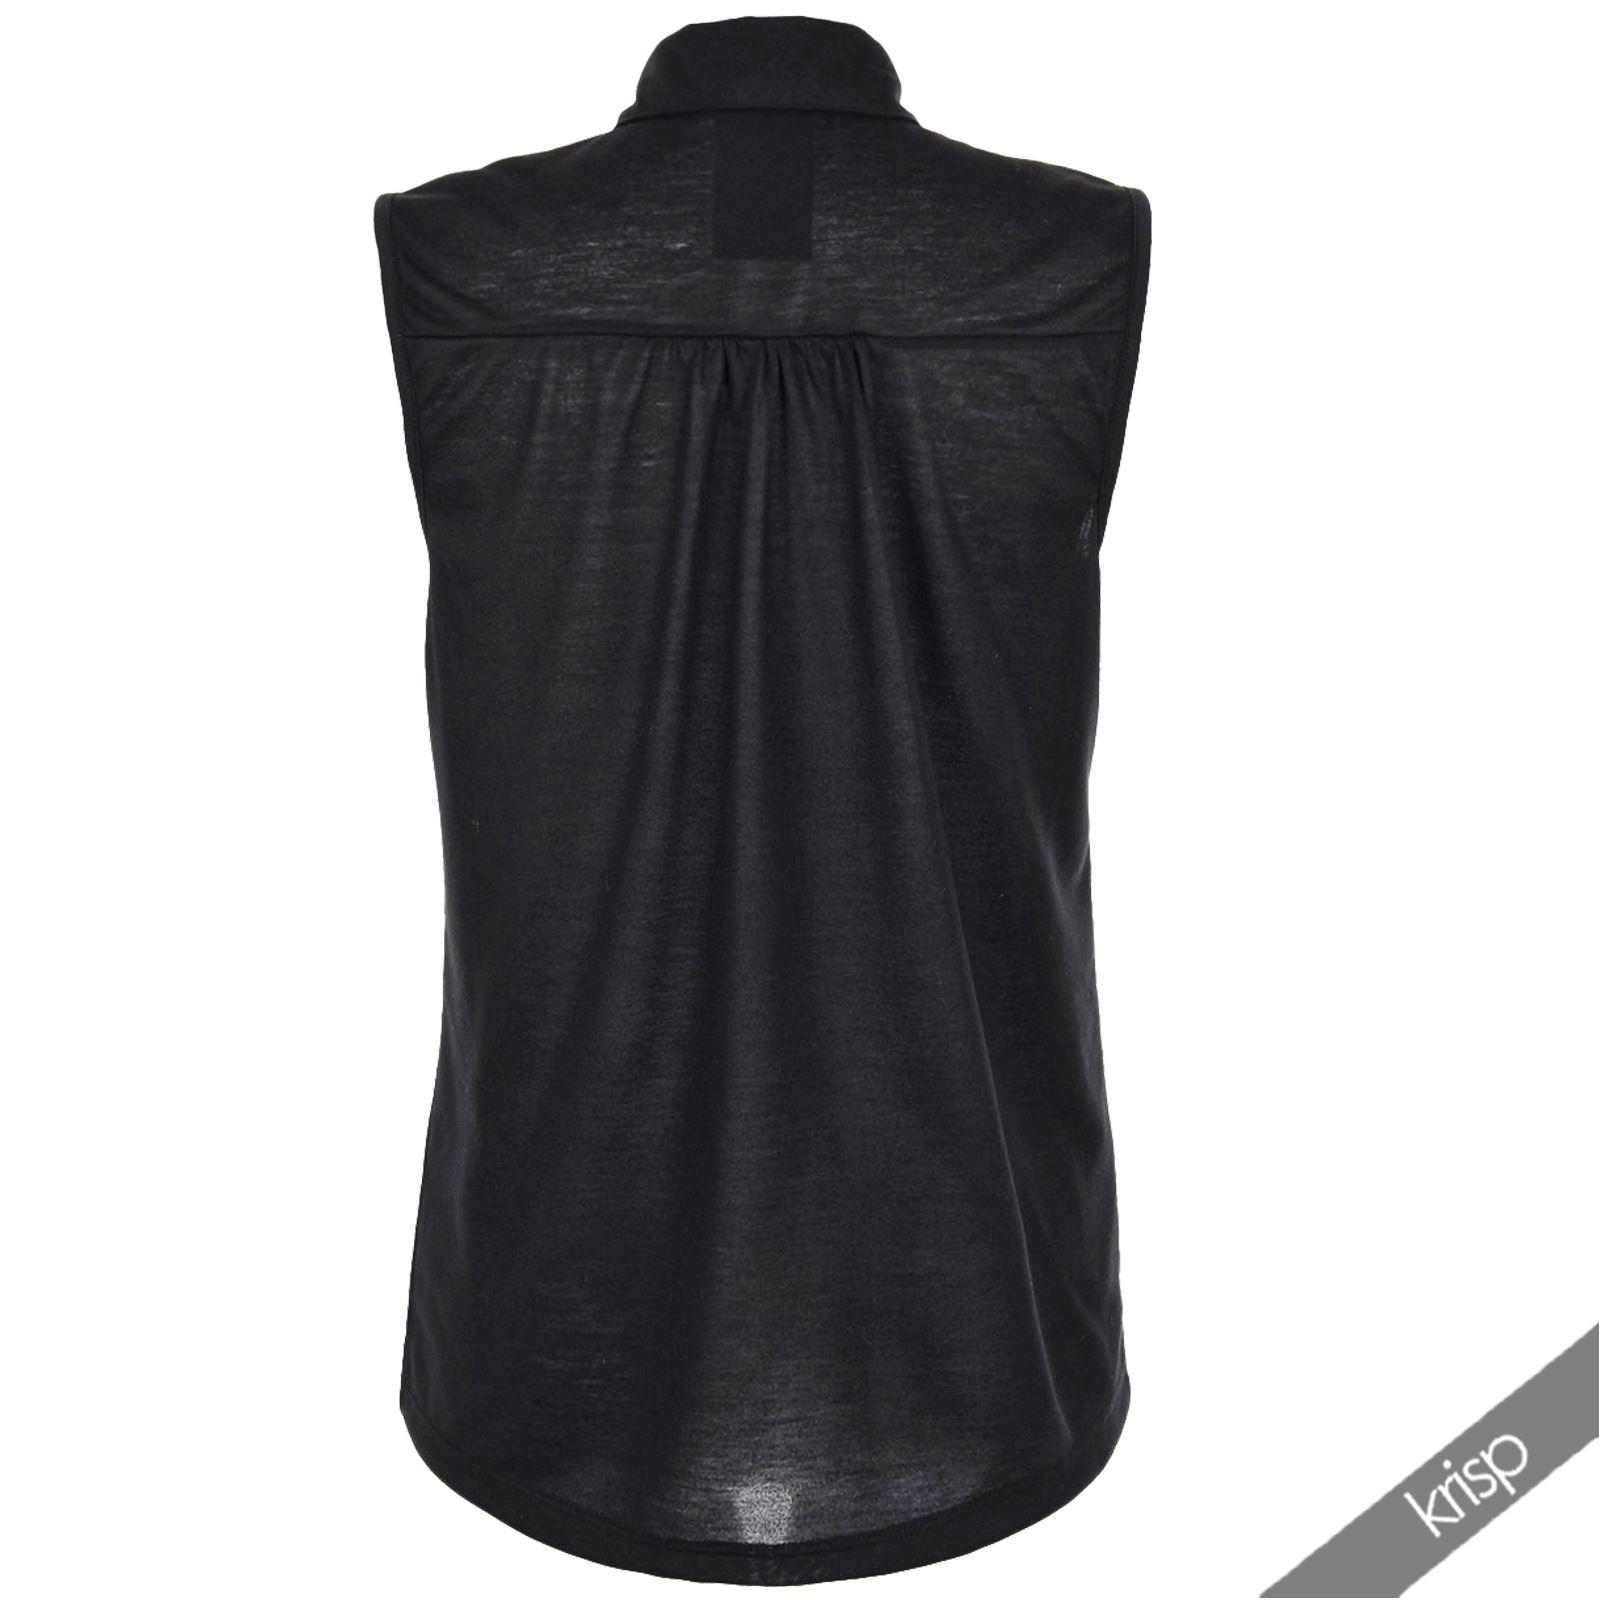 Ladies Women Studded Military Horse Print Shirt Vest Blouse Top Retro Vintage